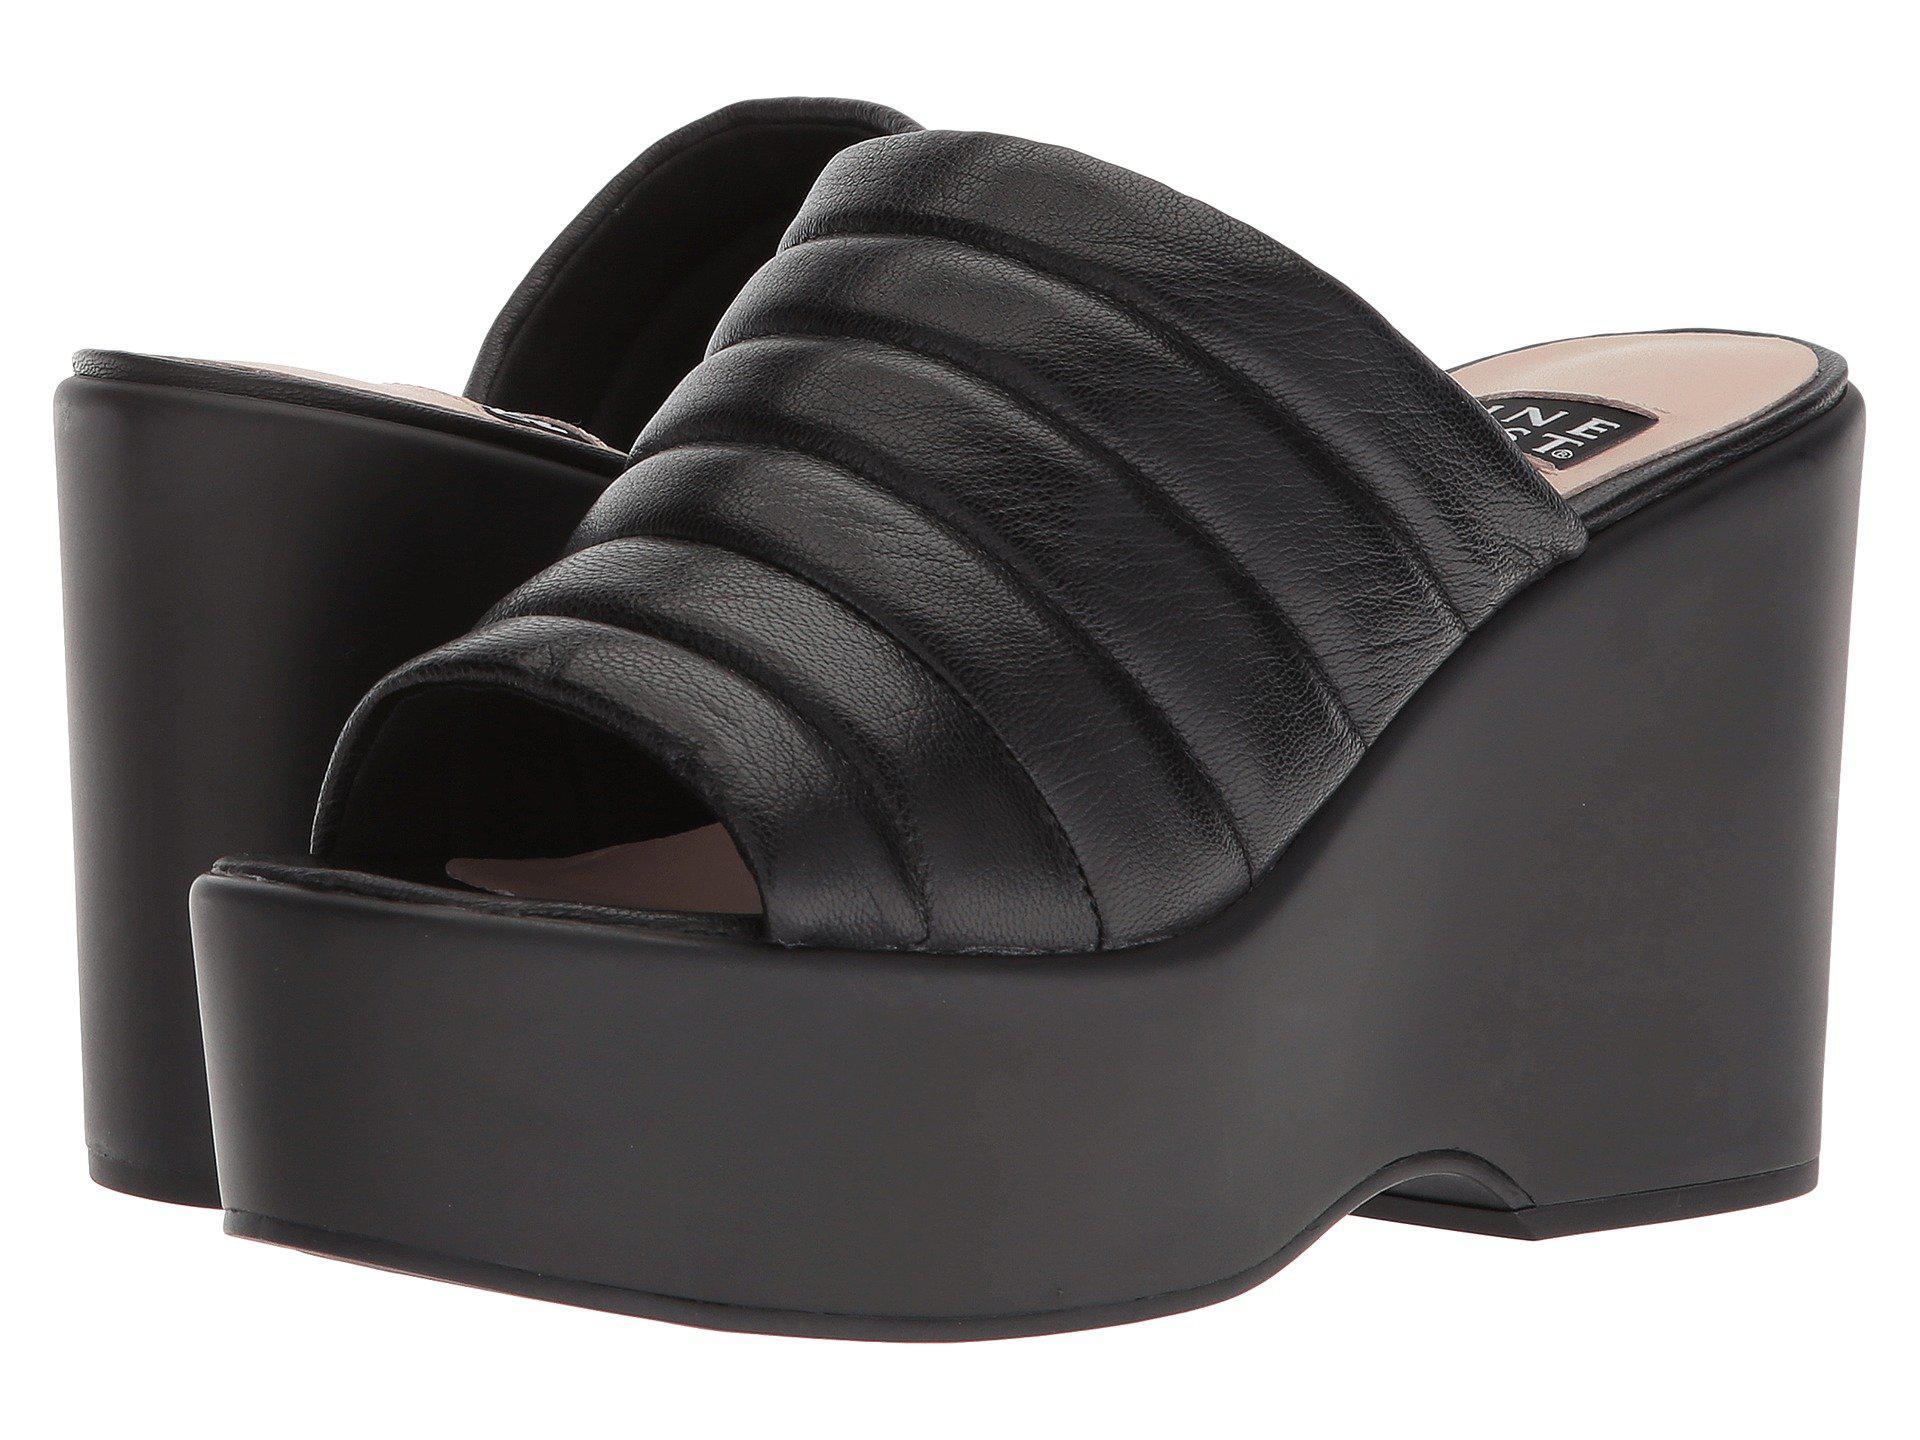 Nine West Millie 40th Anniversary Platform Slide Sandal DaJ0f